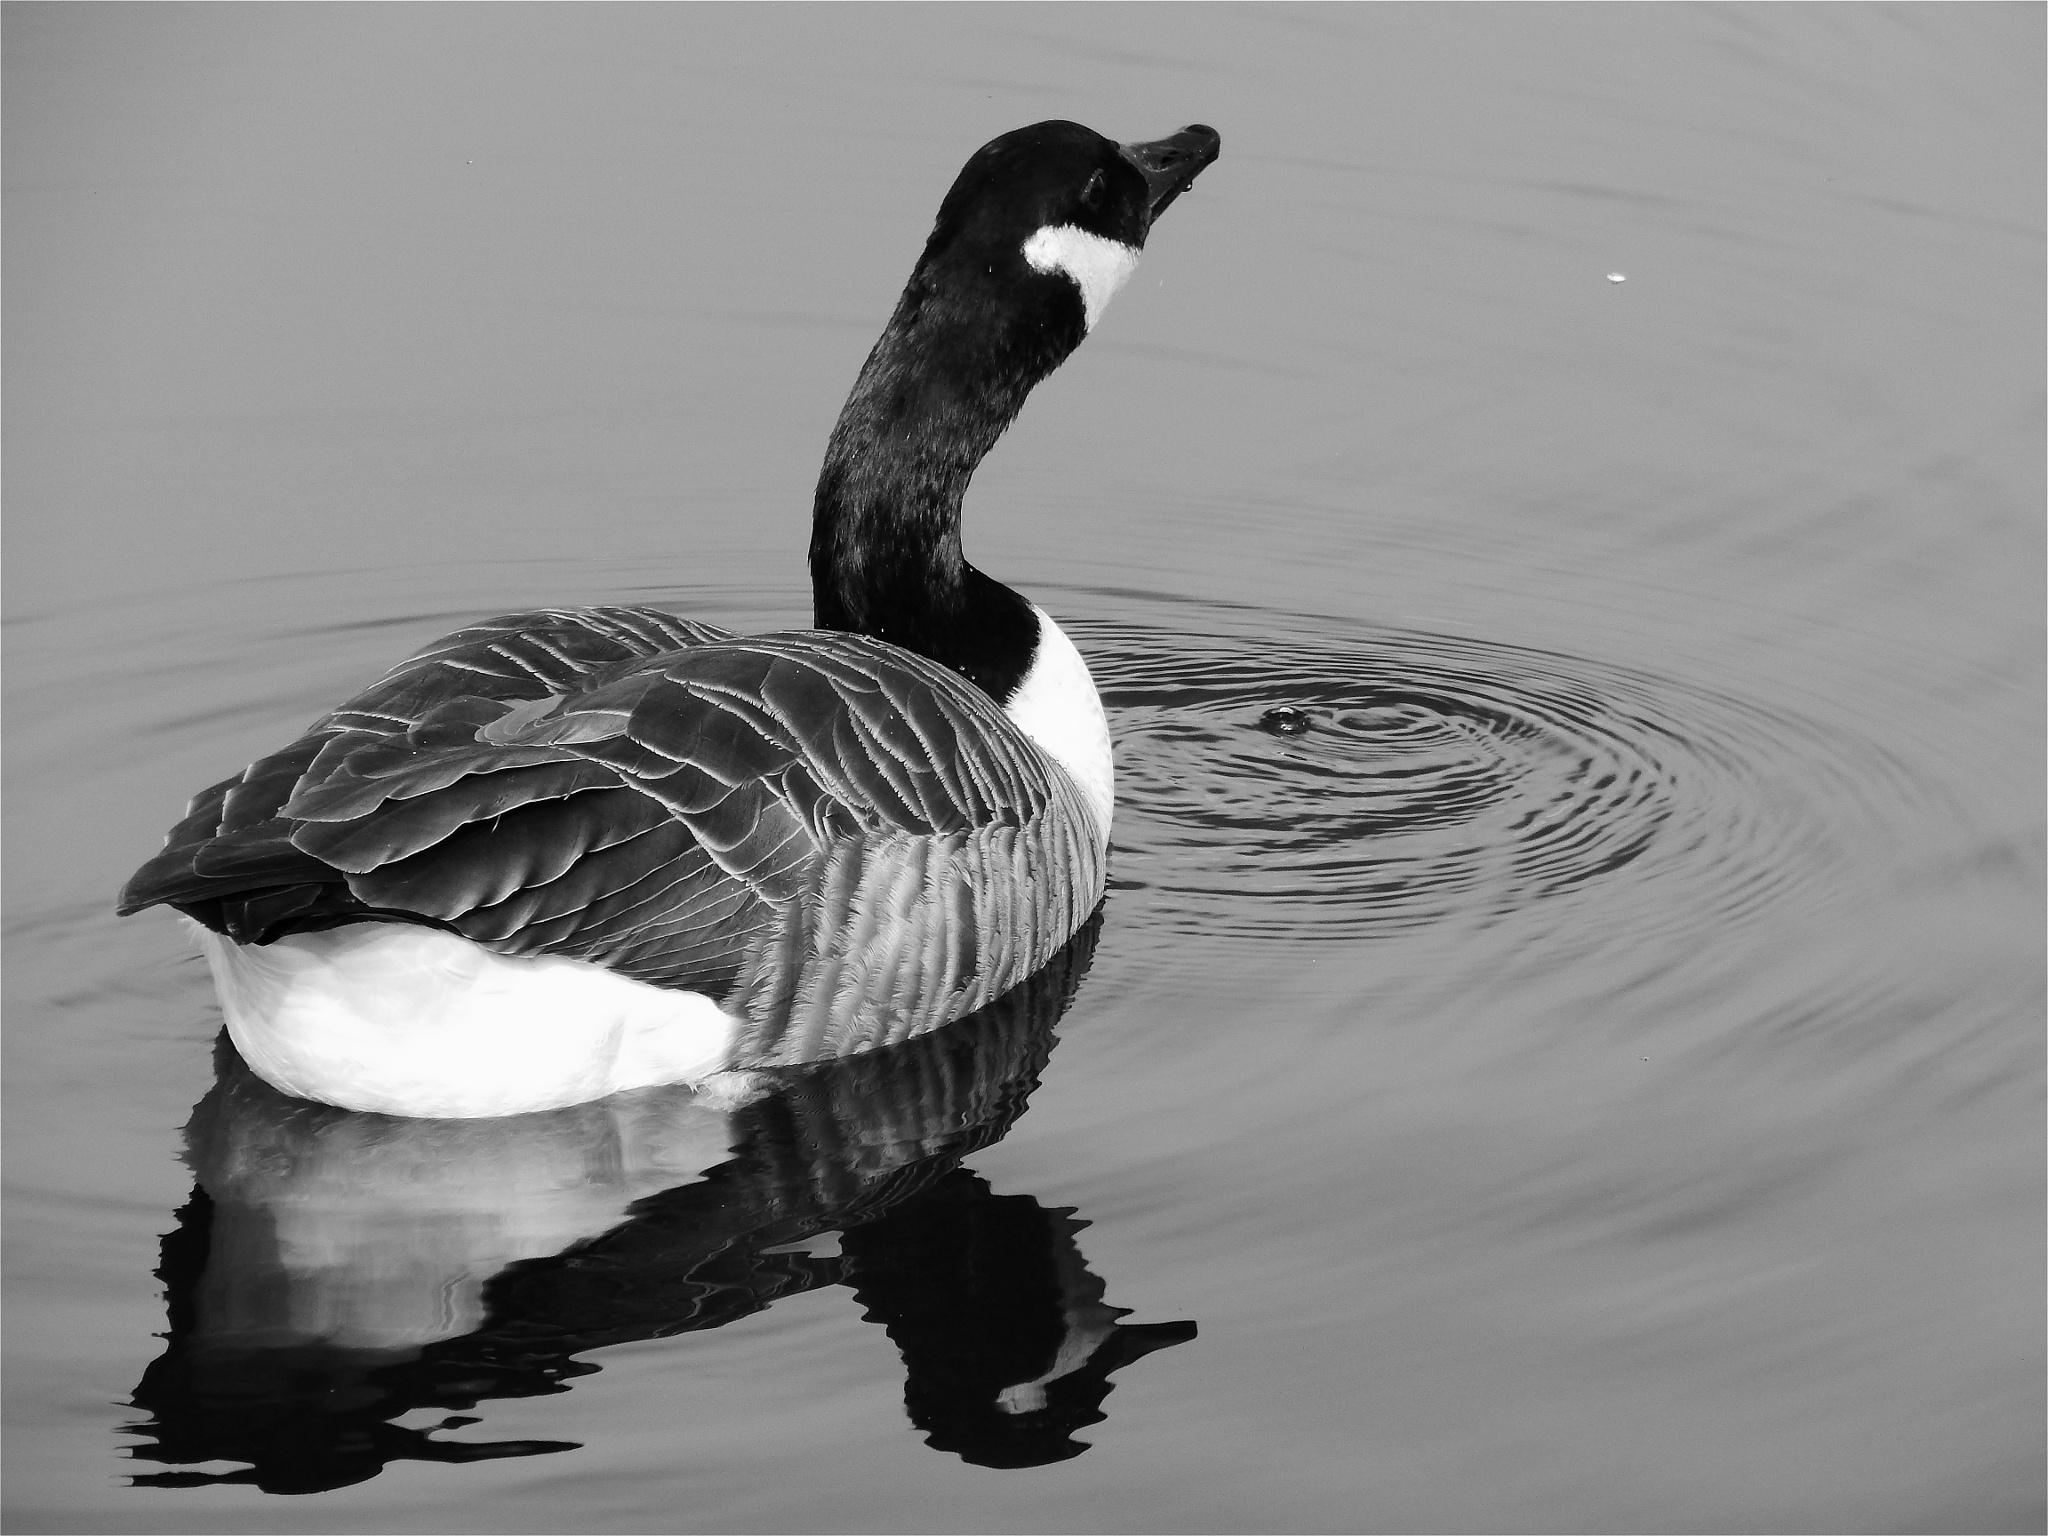 canadian goose drinking by nikita.buckley.9